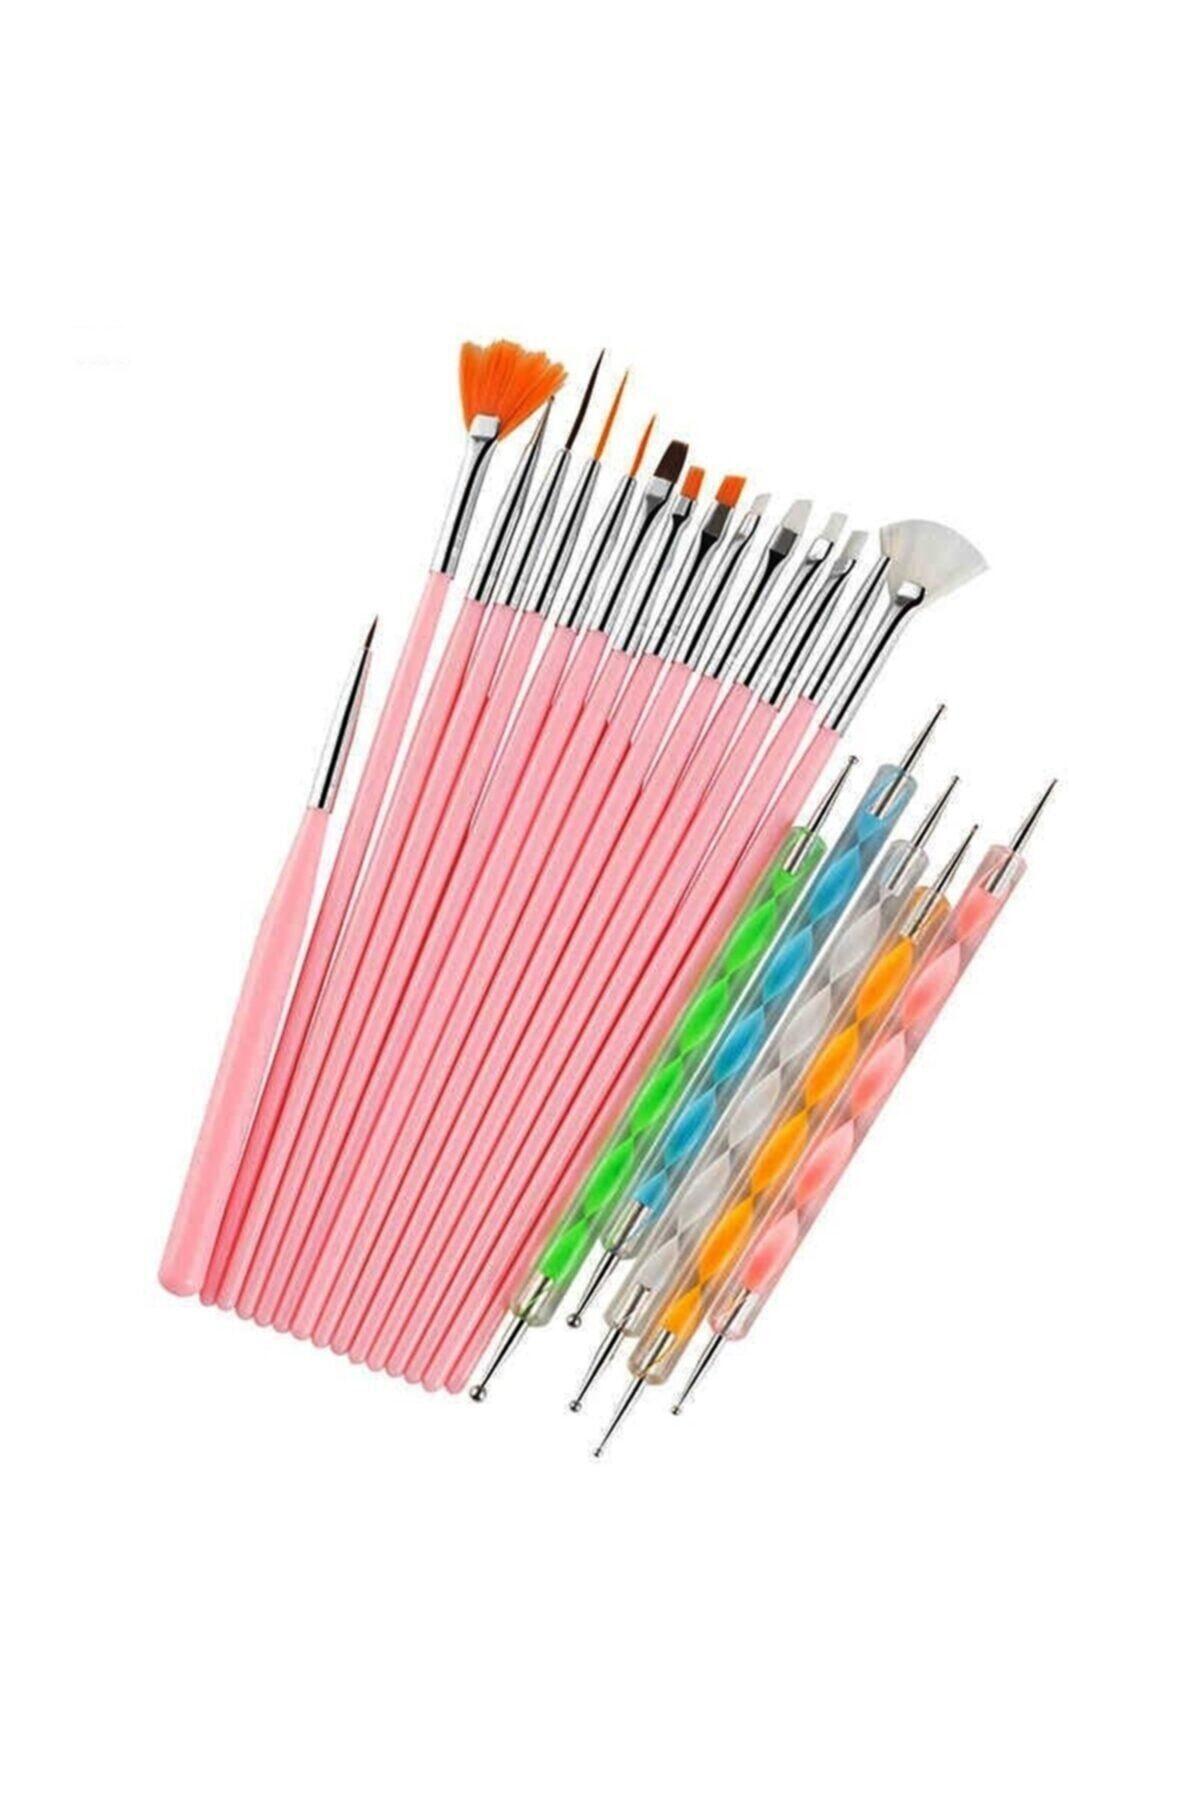 20 Parça Nail Art Tırnak Süsleme Desen Fırça Ve Dot Kalem Seti Pembe